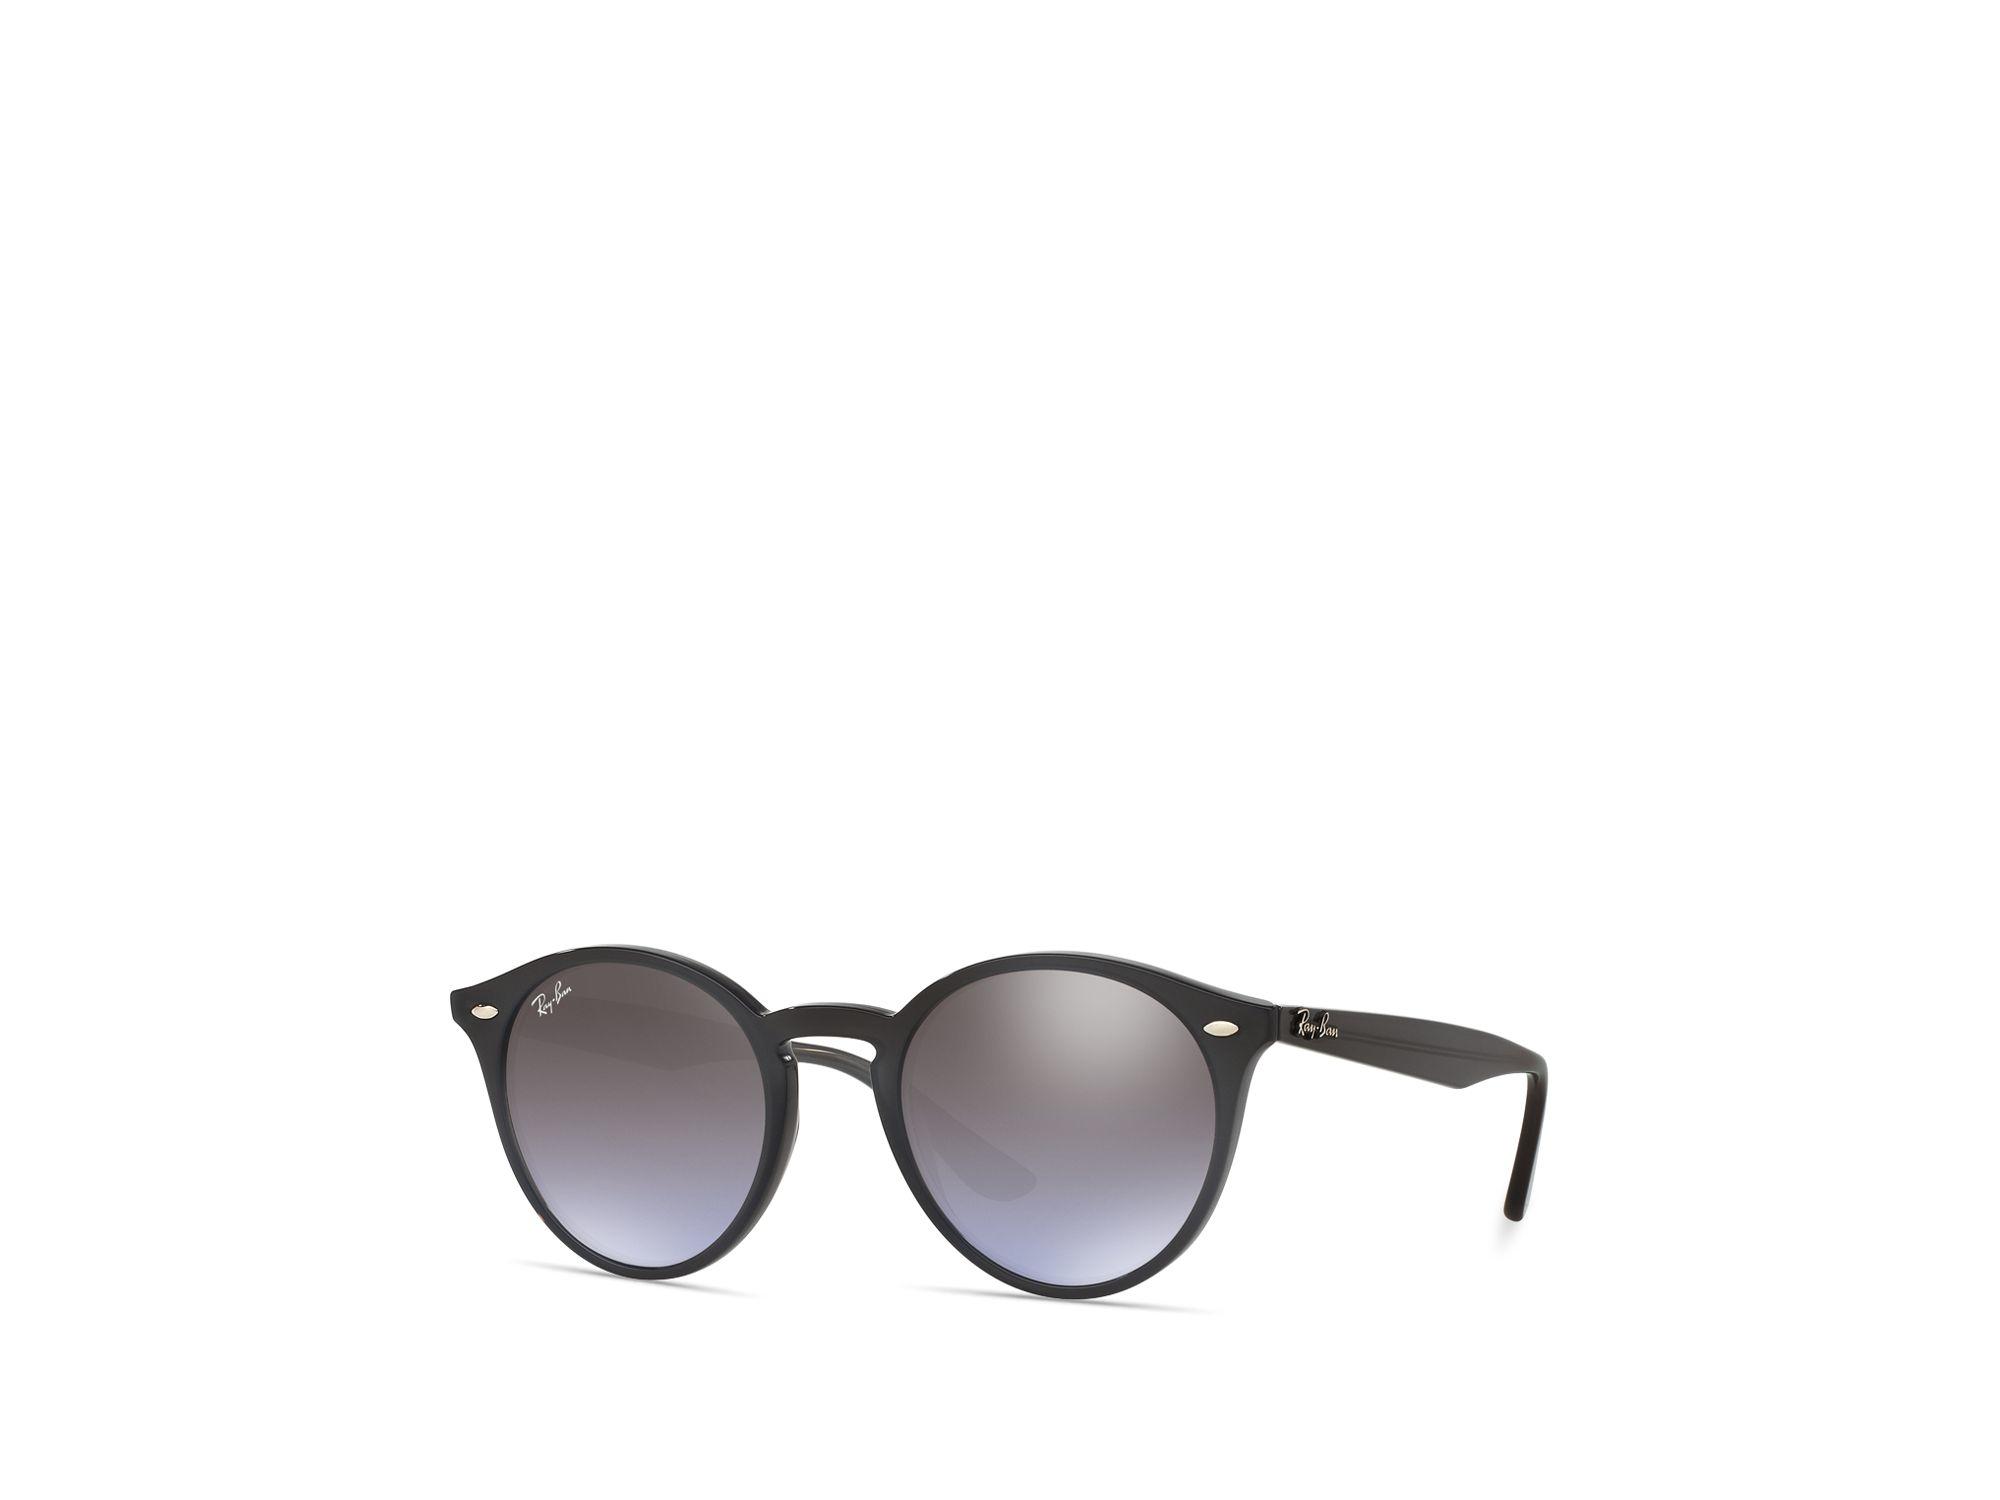 792c0d4c37 Boots Oakley Prescription Sunglasses « Heritage Malta